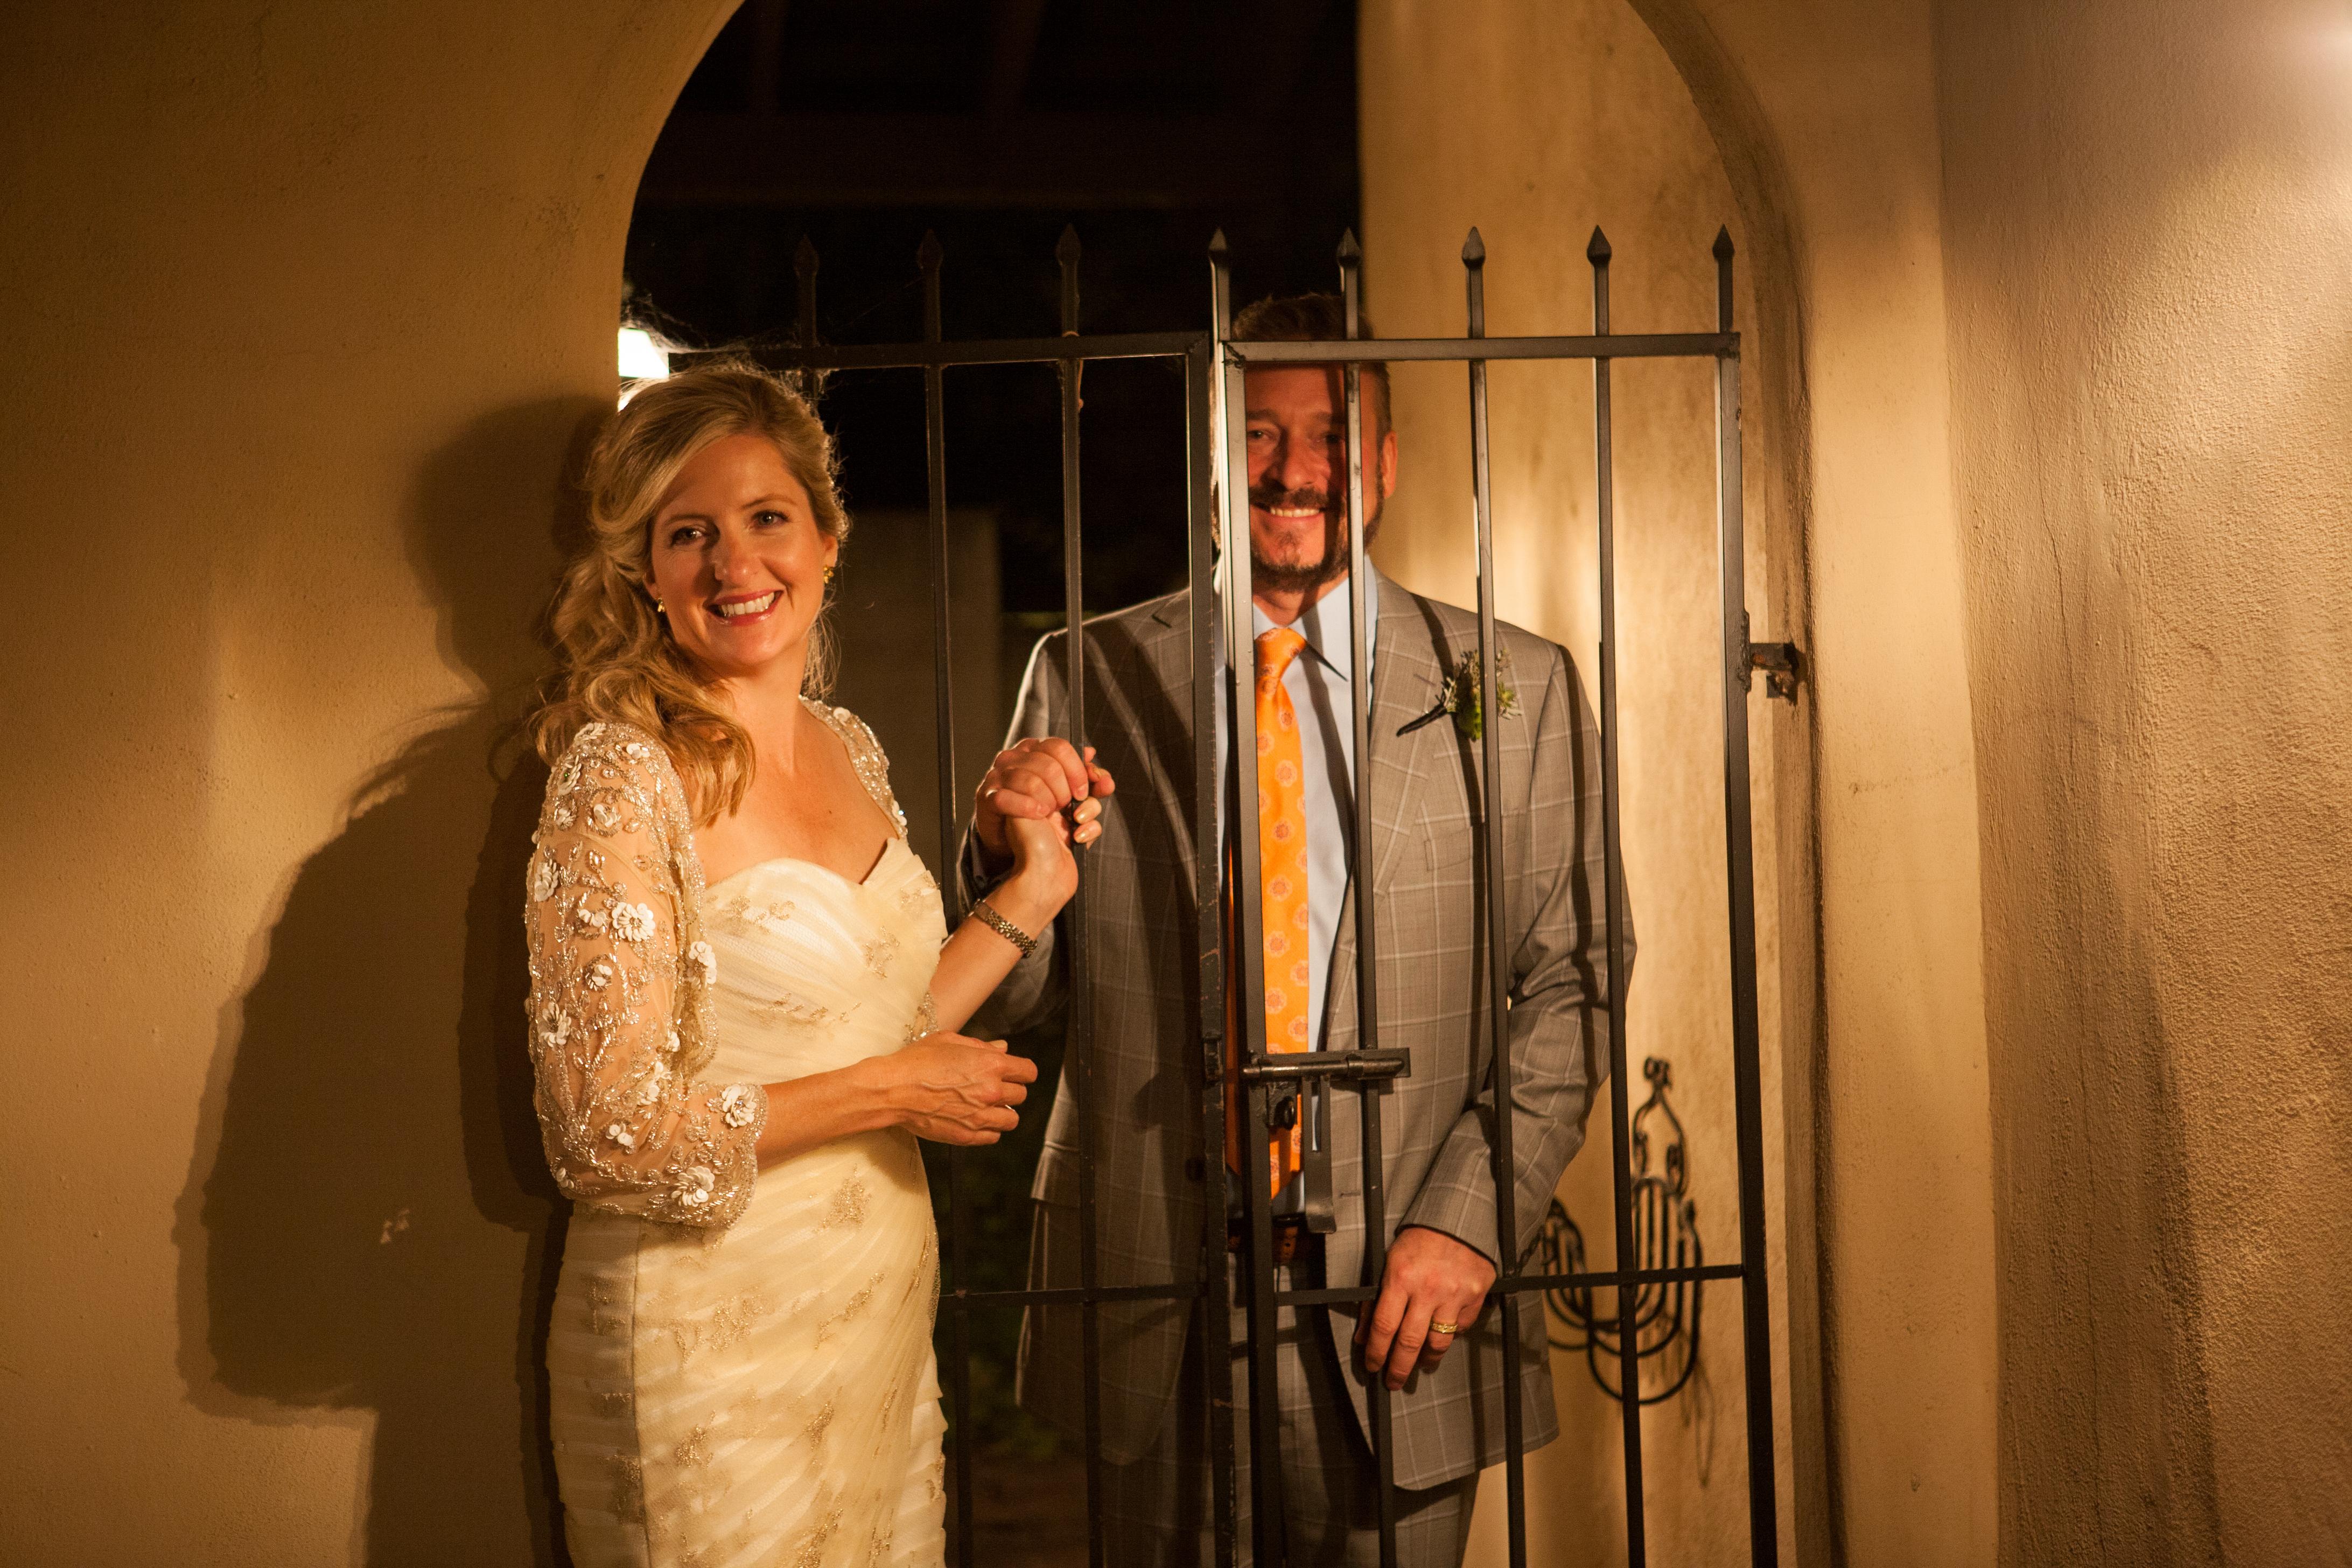 Small Wedding at Palacio de Marquesa in Taos, NM